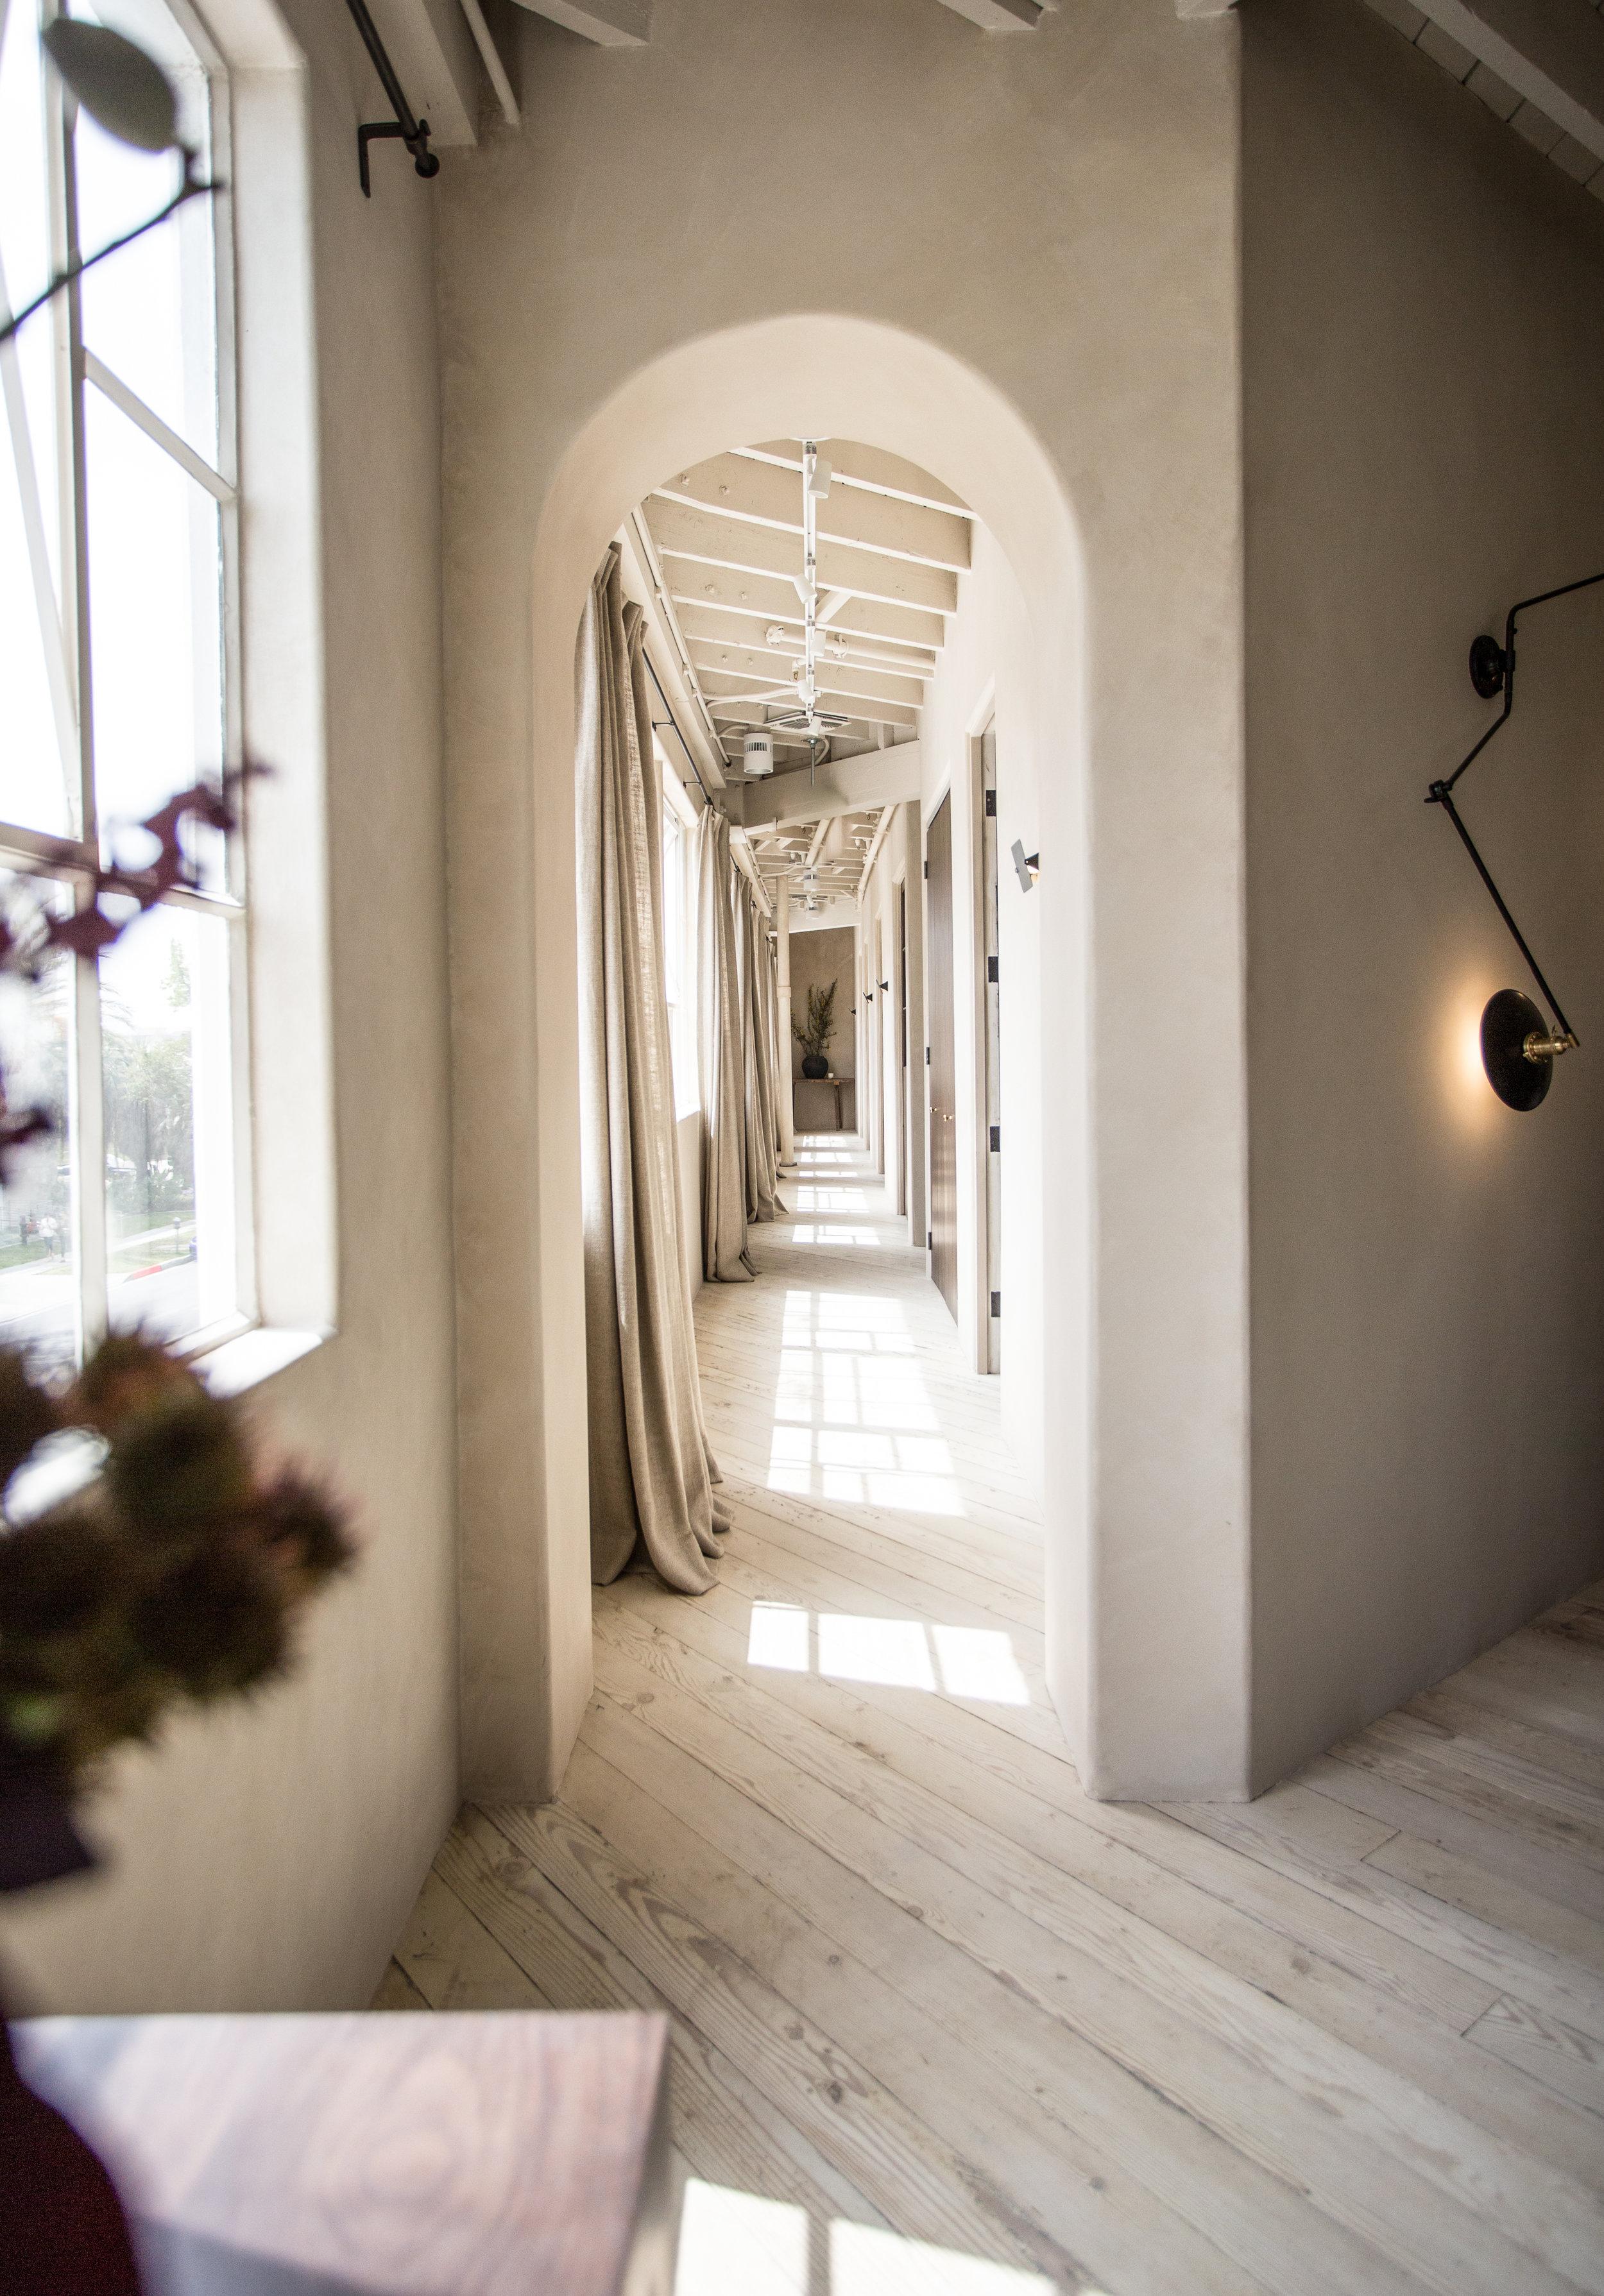 Shani Darden Studio - Hallway.jpg